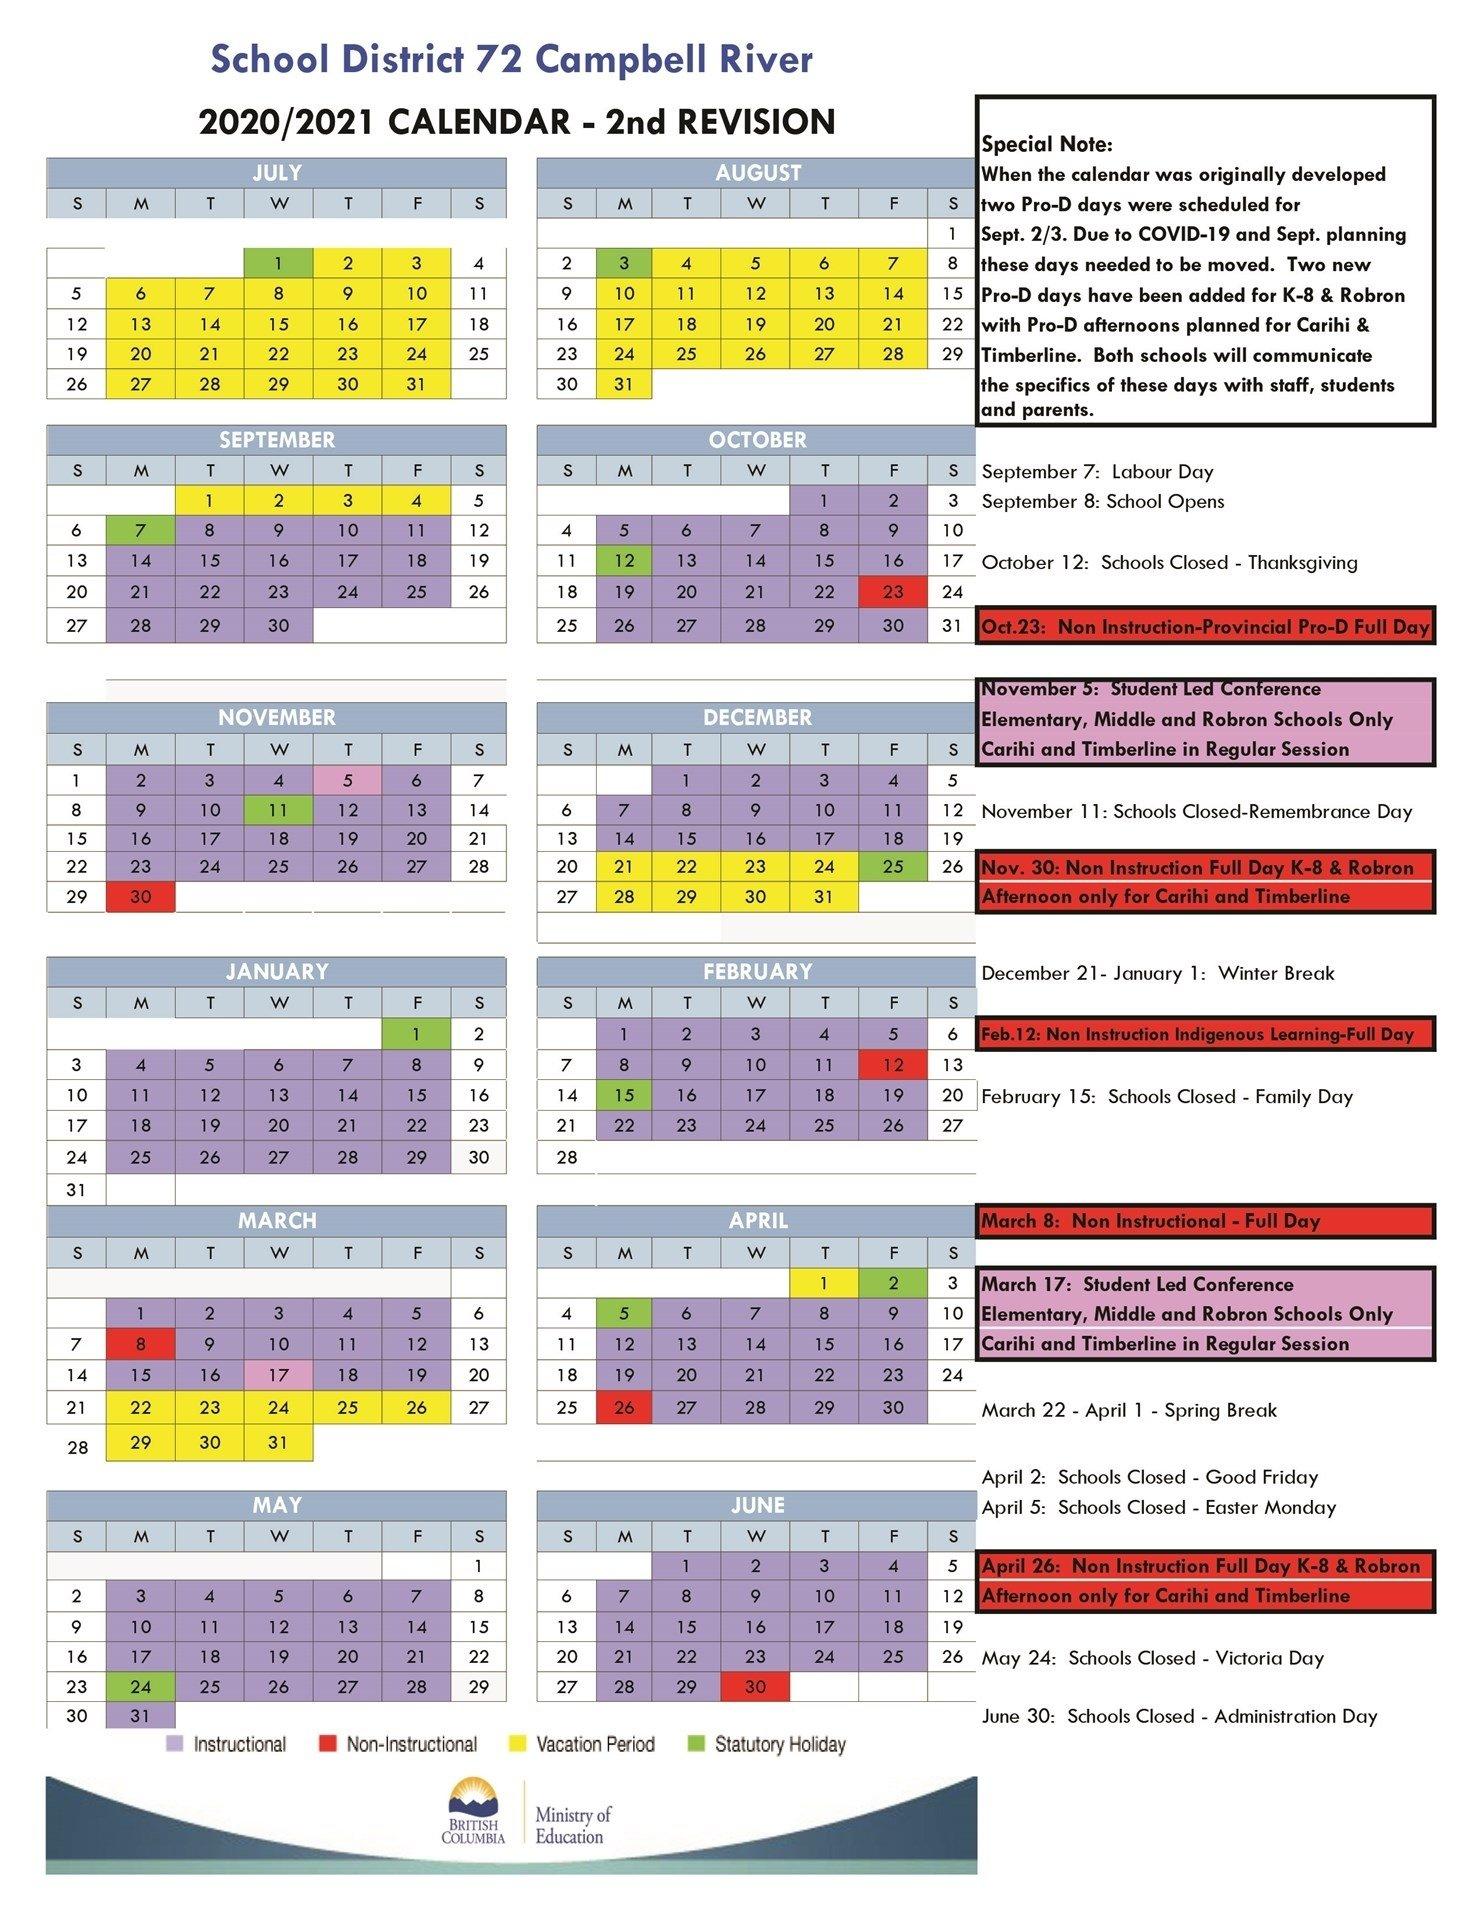 2021 2021 Medication 28 Day Expiration Date Calendar 28 Day Medication Calender